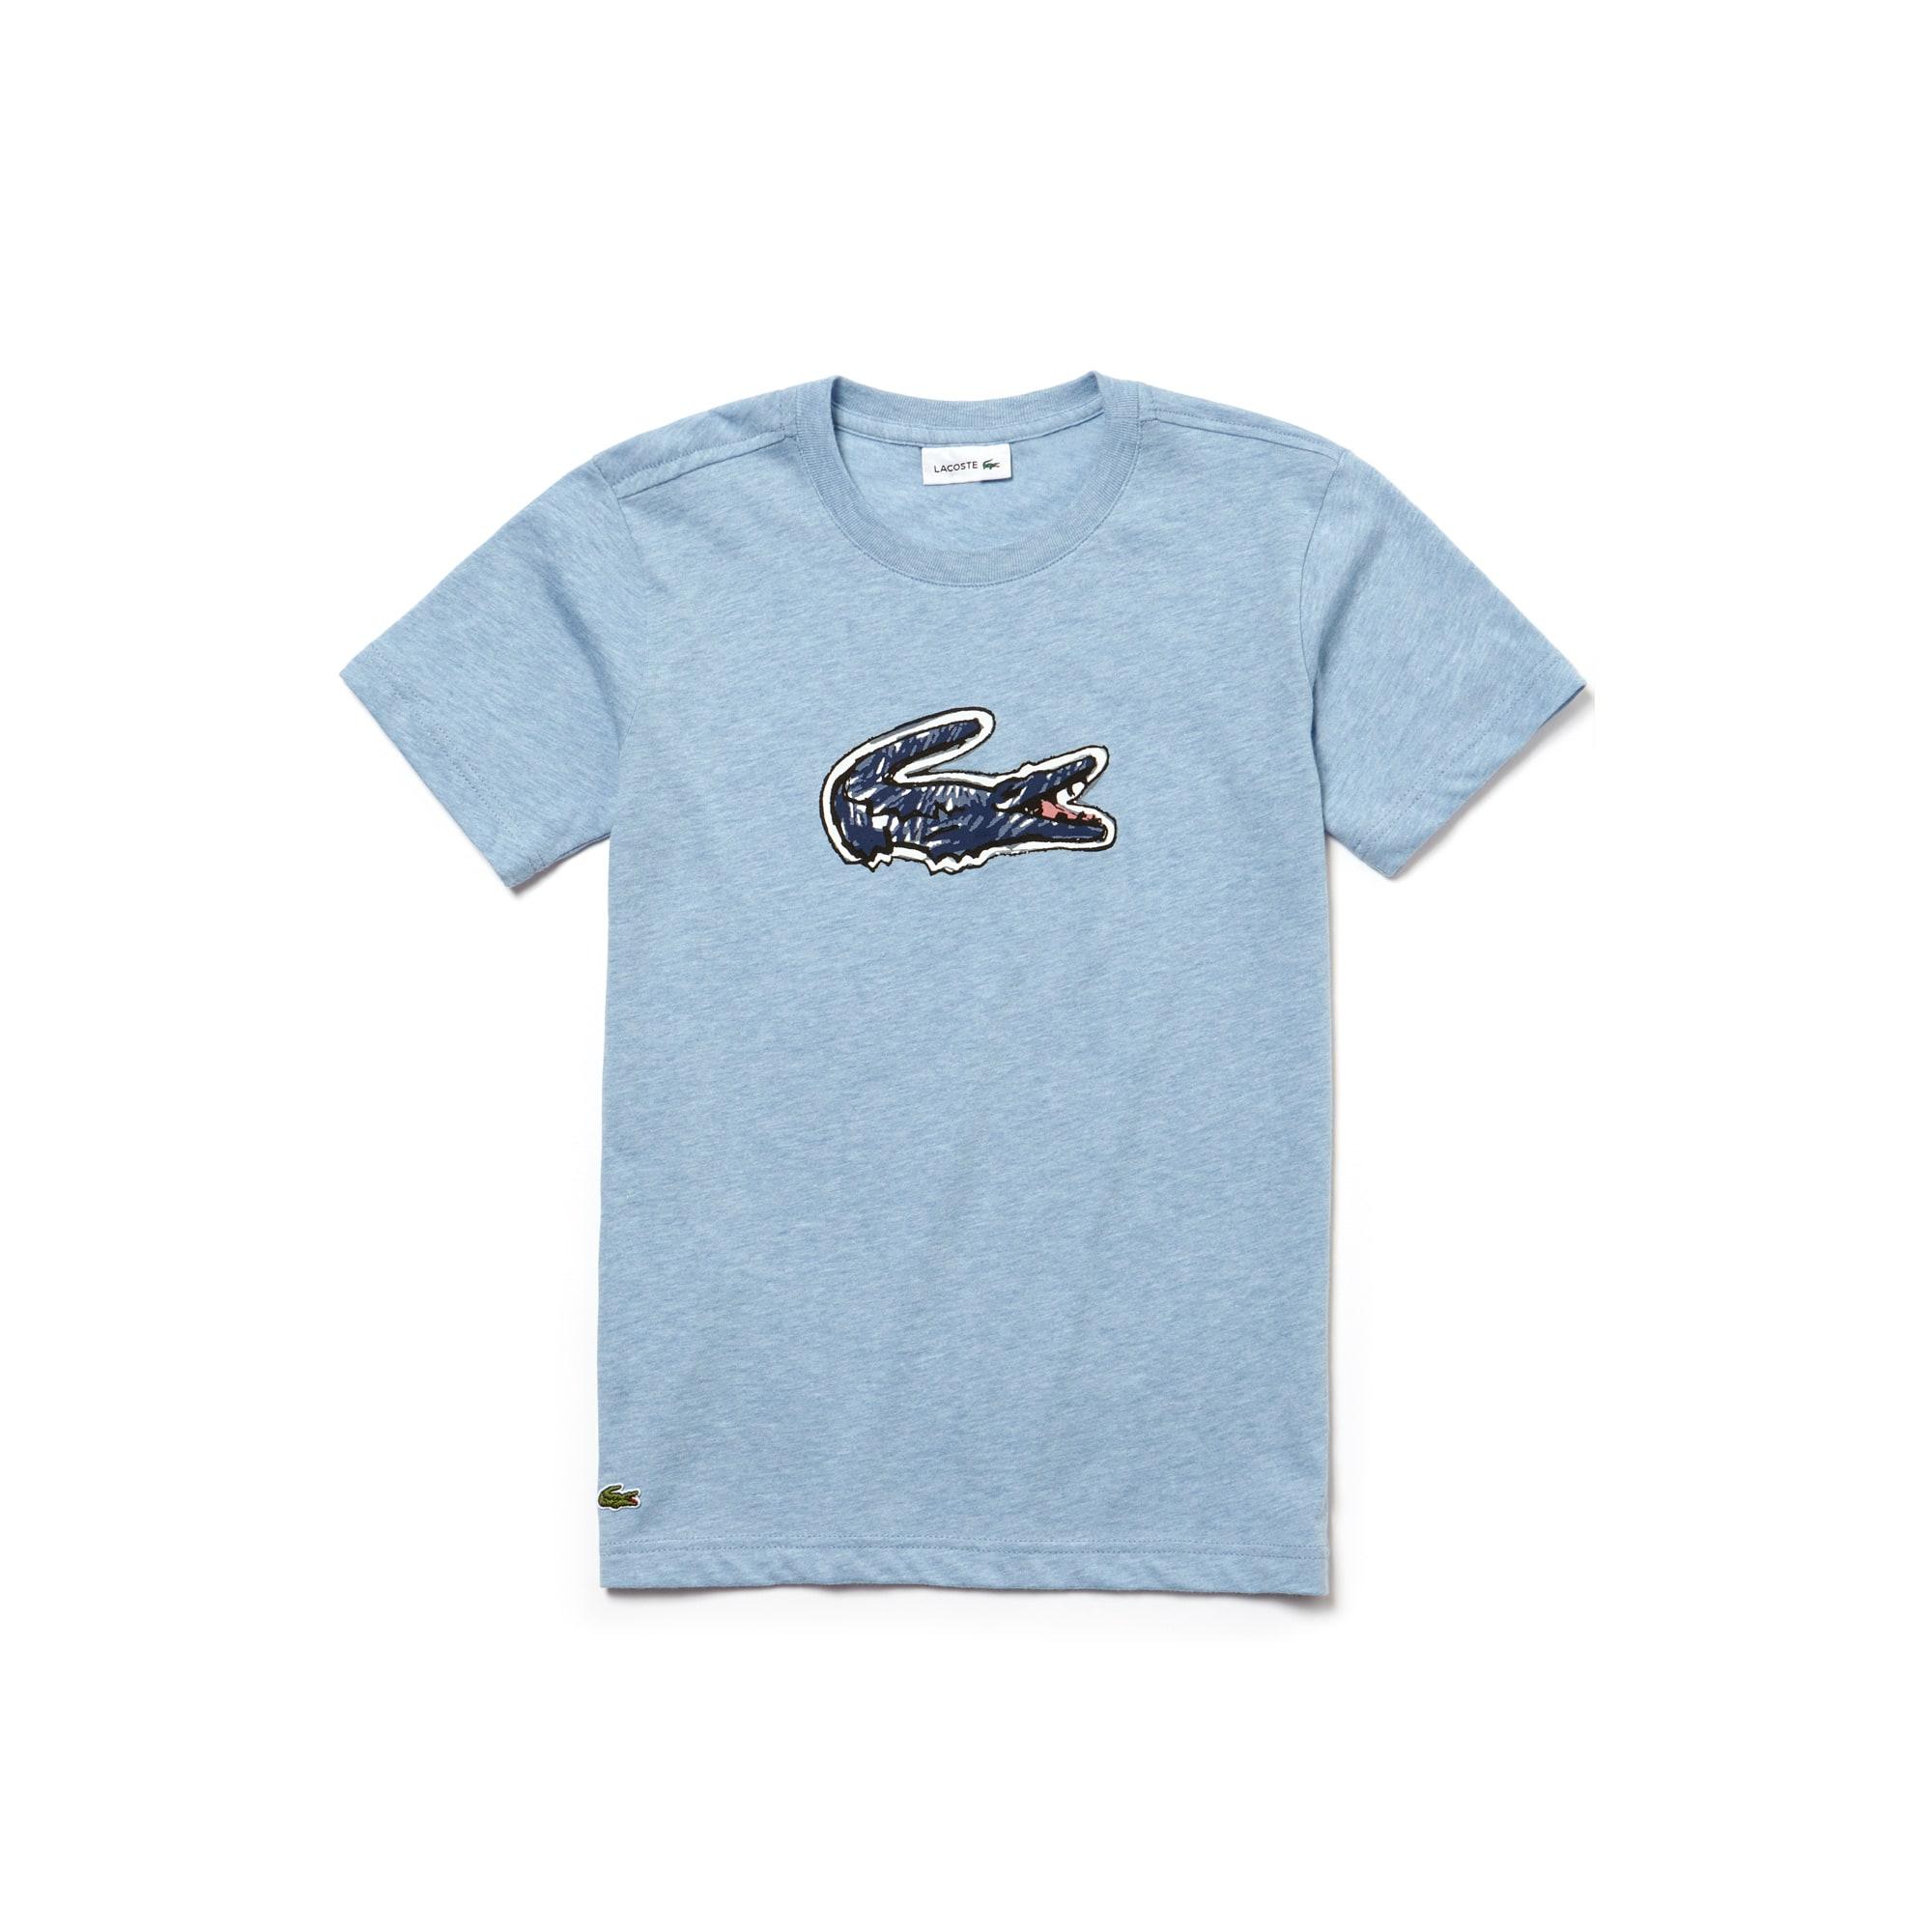 T-shirt Bambino a girocollo in jersey indaco con stampa del coccodrillo